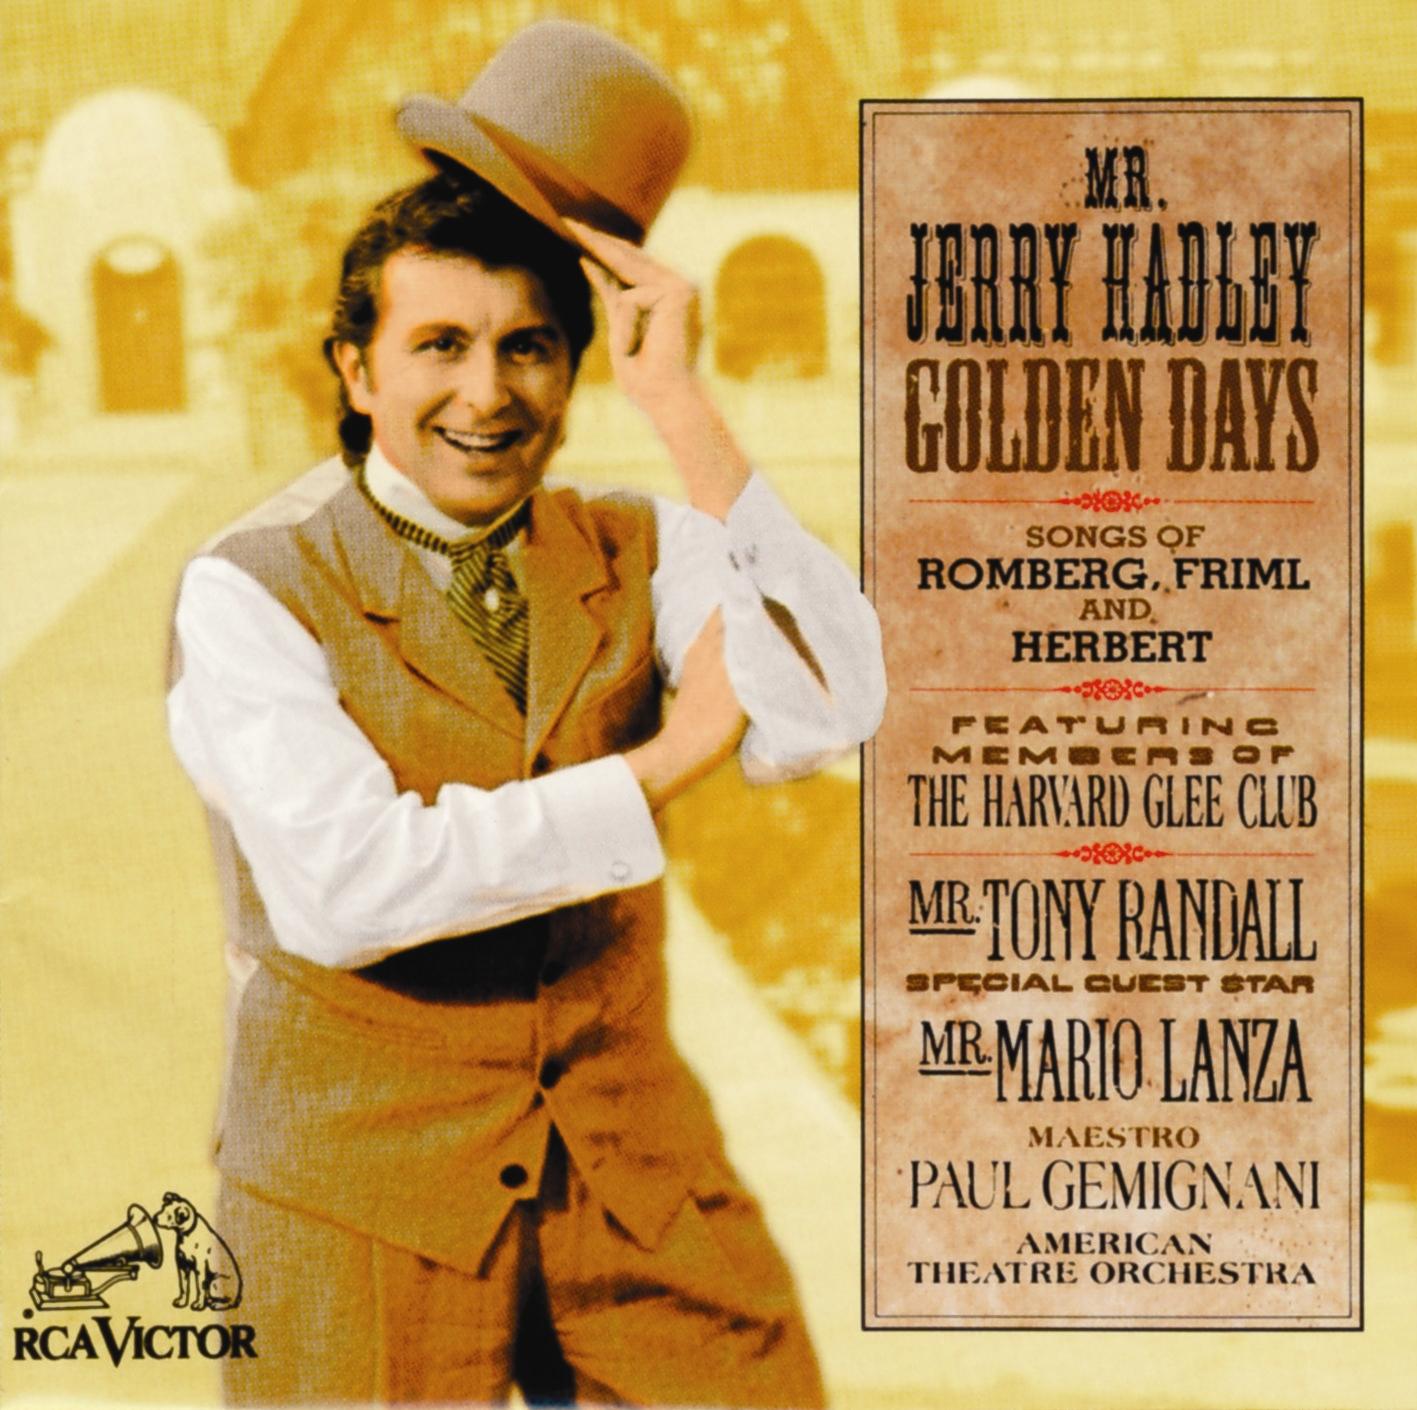 Jerry Hadley: Golden Days – Songs of Romberg, Friml, and Herbert